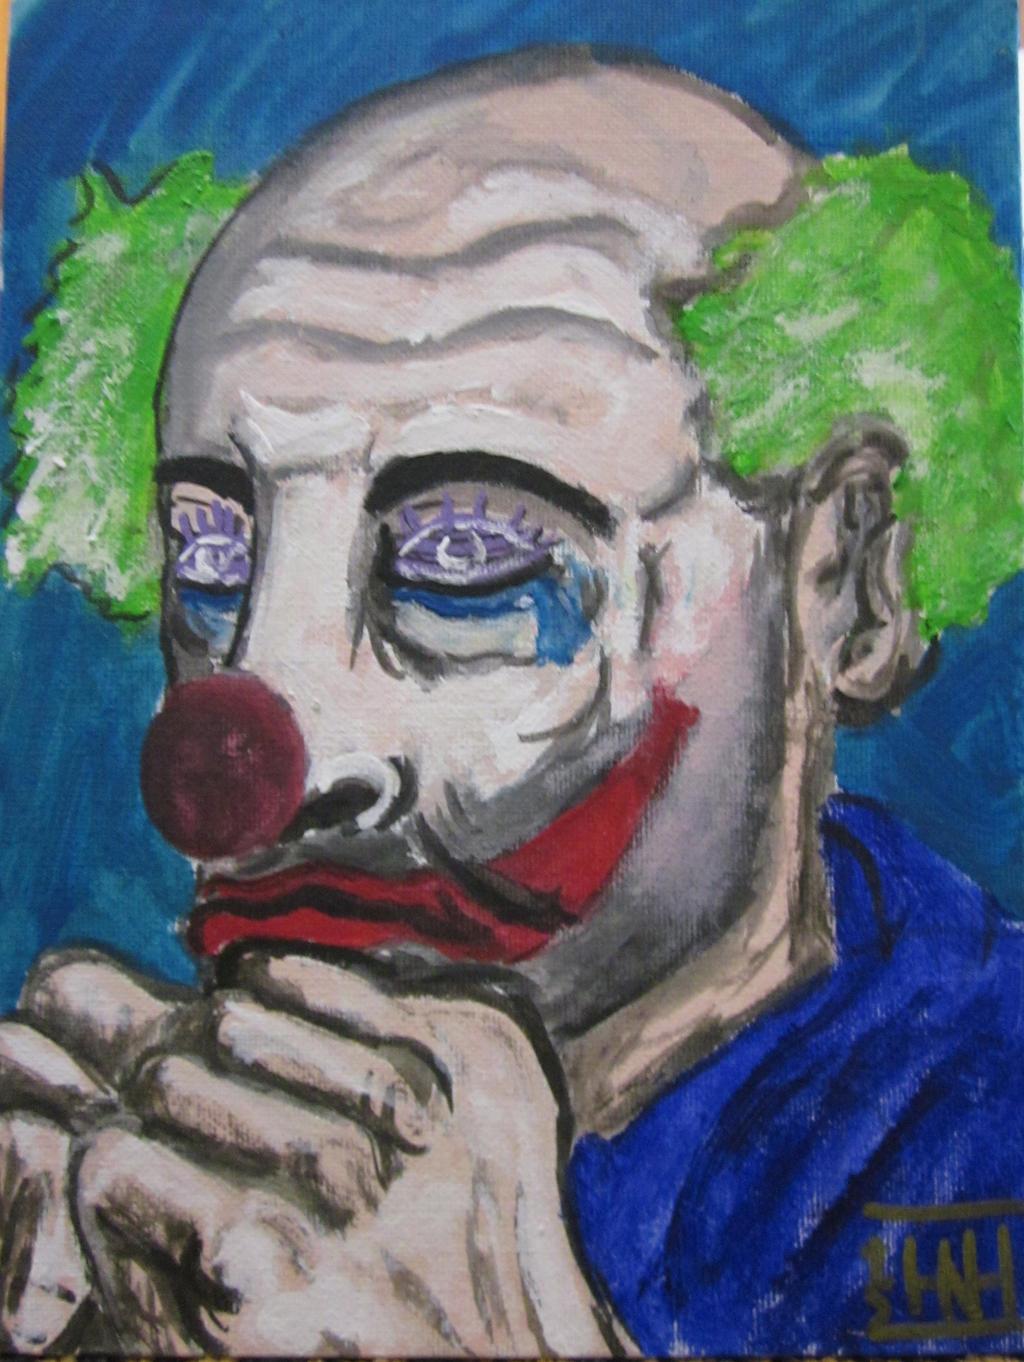 foto de Sad Clown by Mandinga91 on DeviantArt